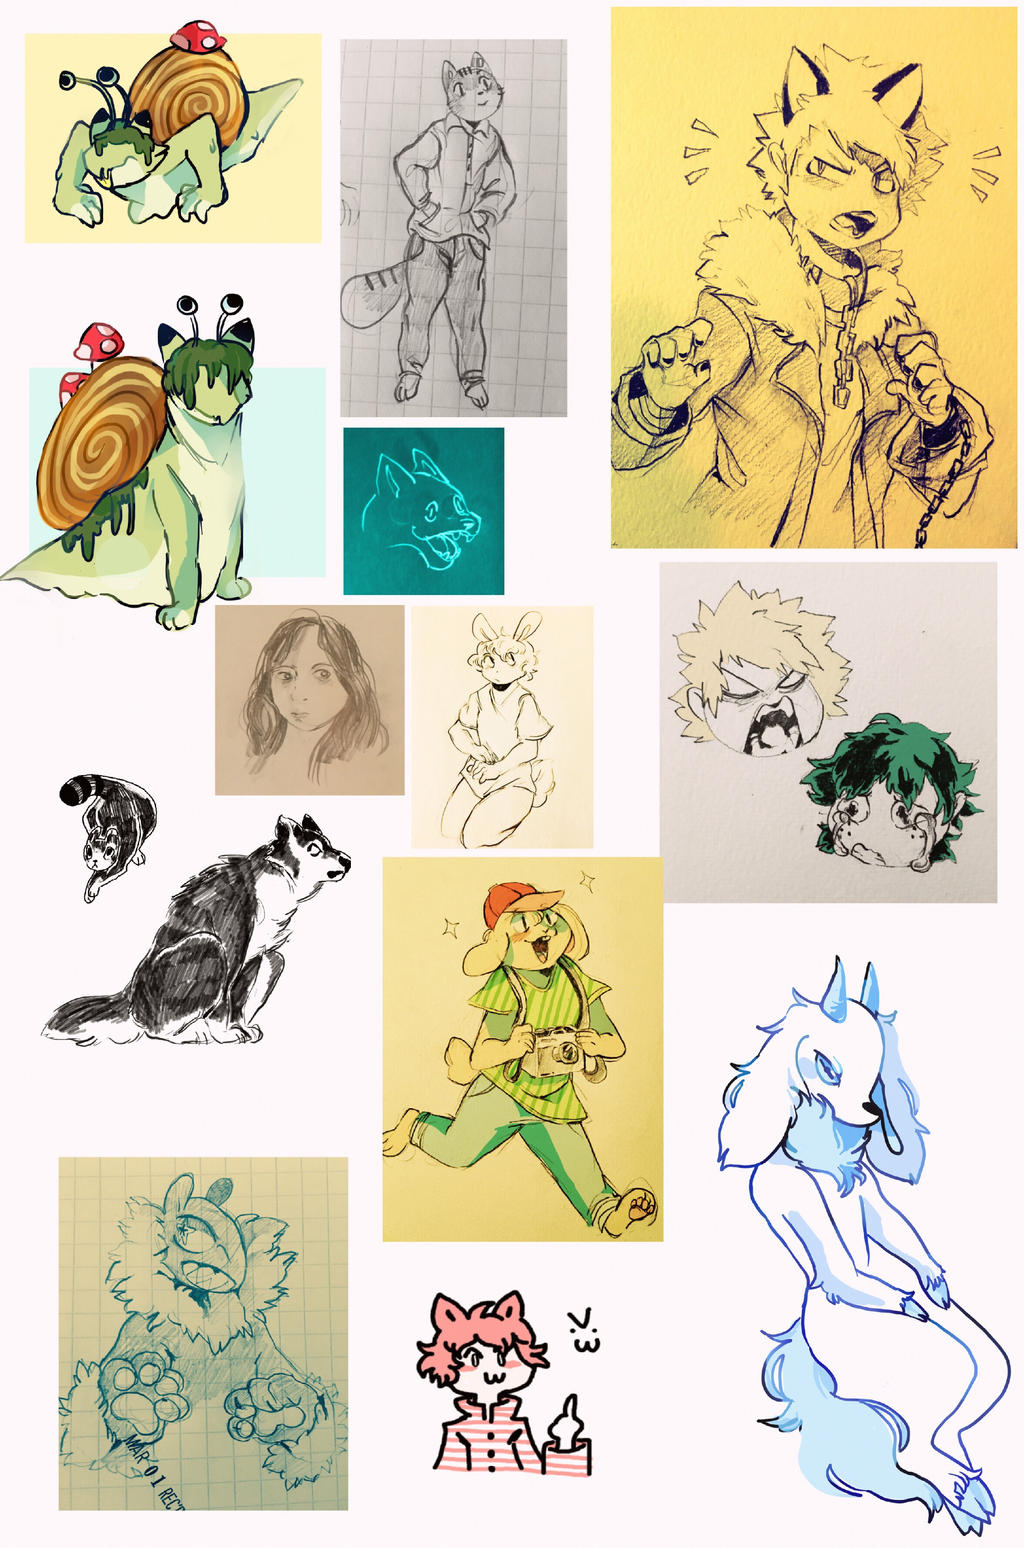 sketchdump11 by cayotze